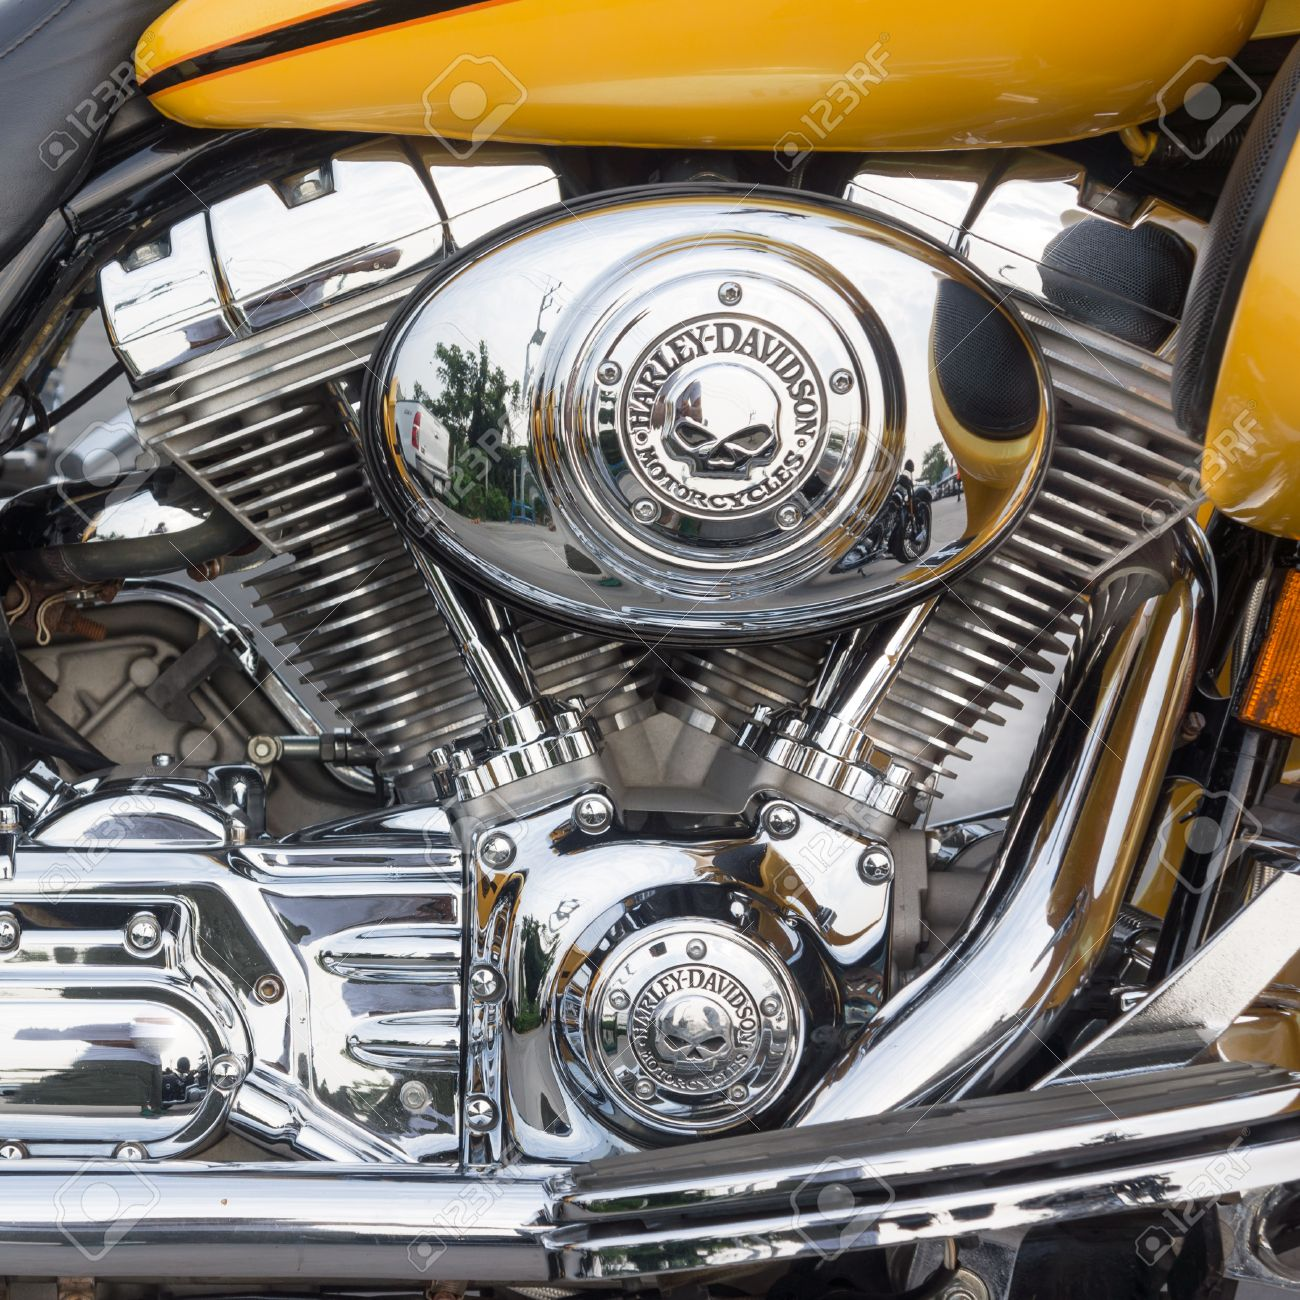 V Twin Stock Photos Royalty Free Images Motorcycle Engine Harley Davidson Closeup